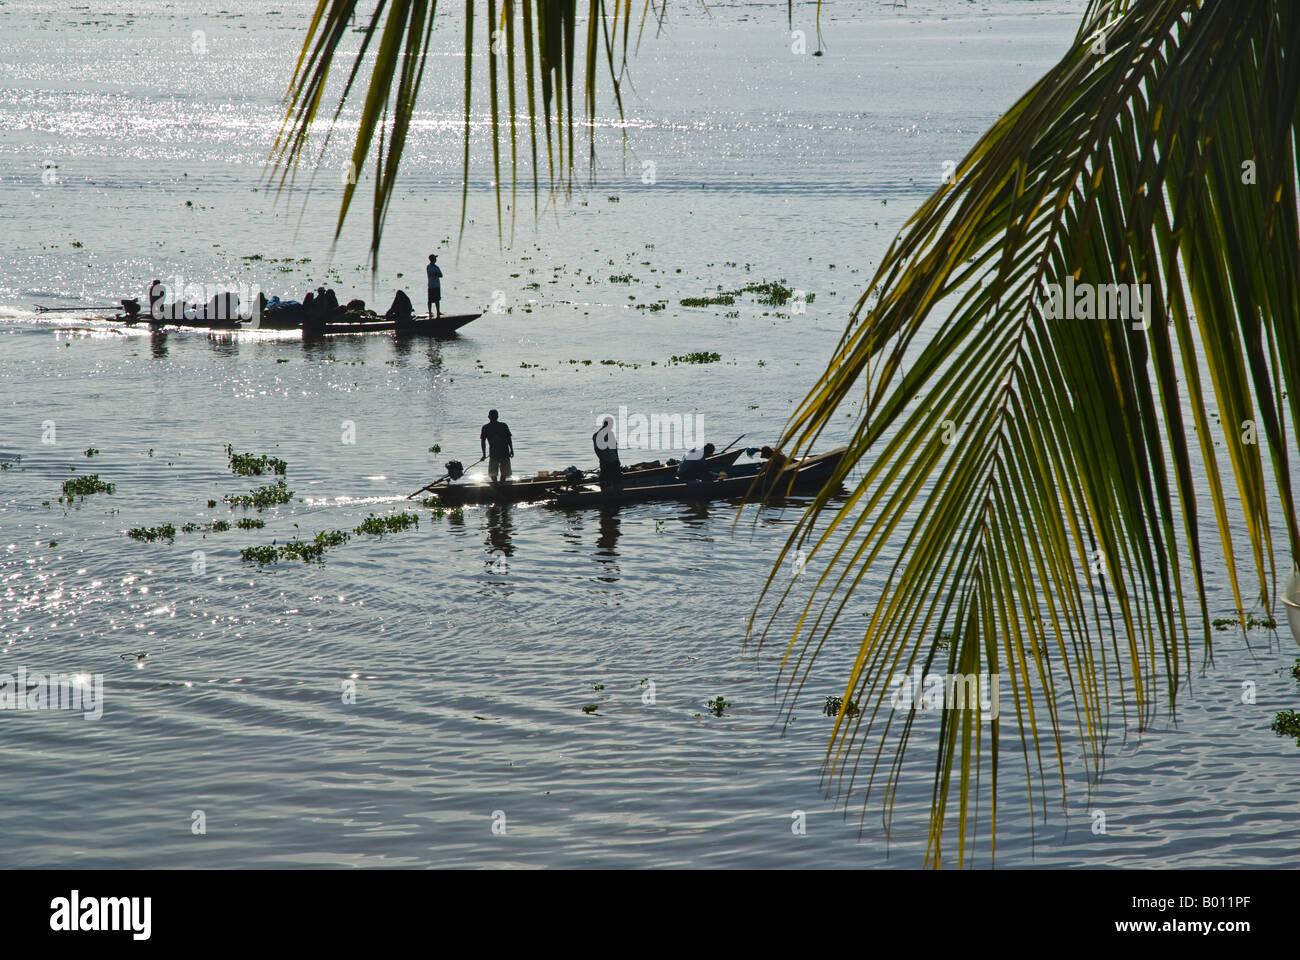 Peru, Amazon, Amazon River. Ferryboats carrying passengers across the Amazon River. - Stock Image